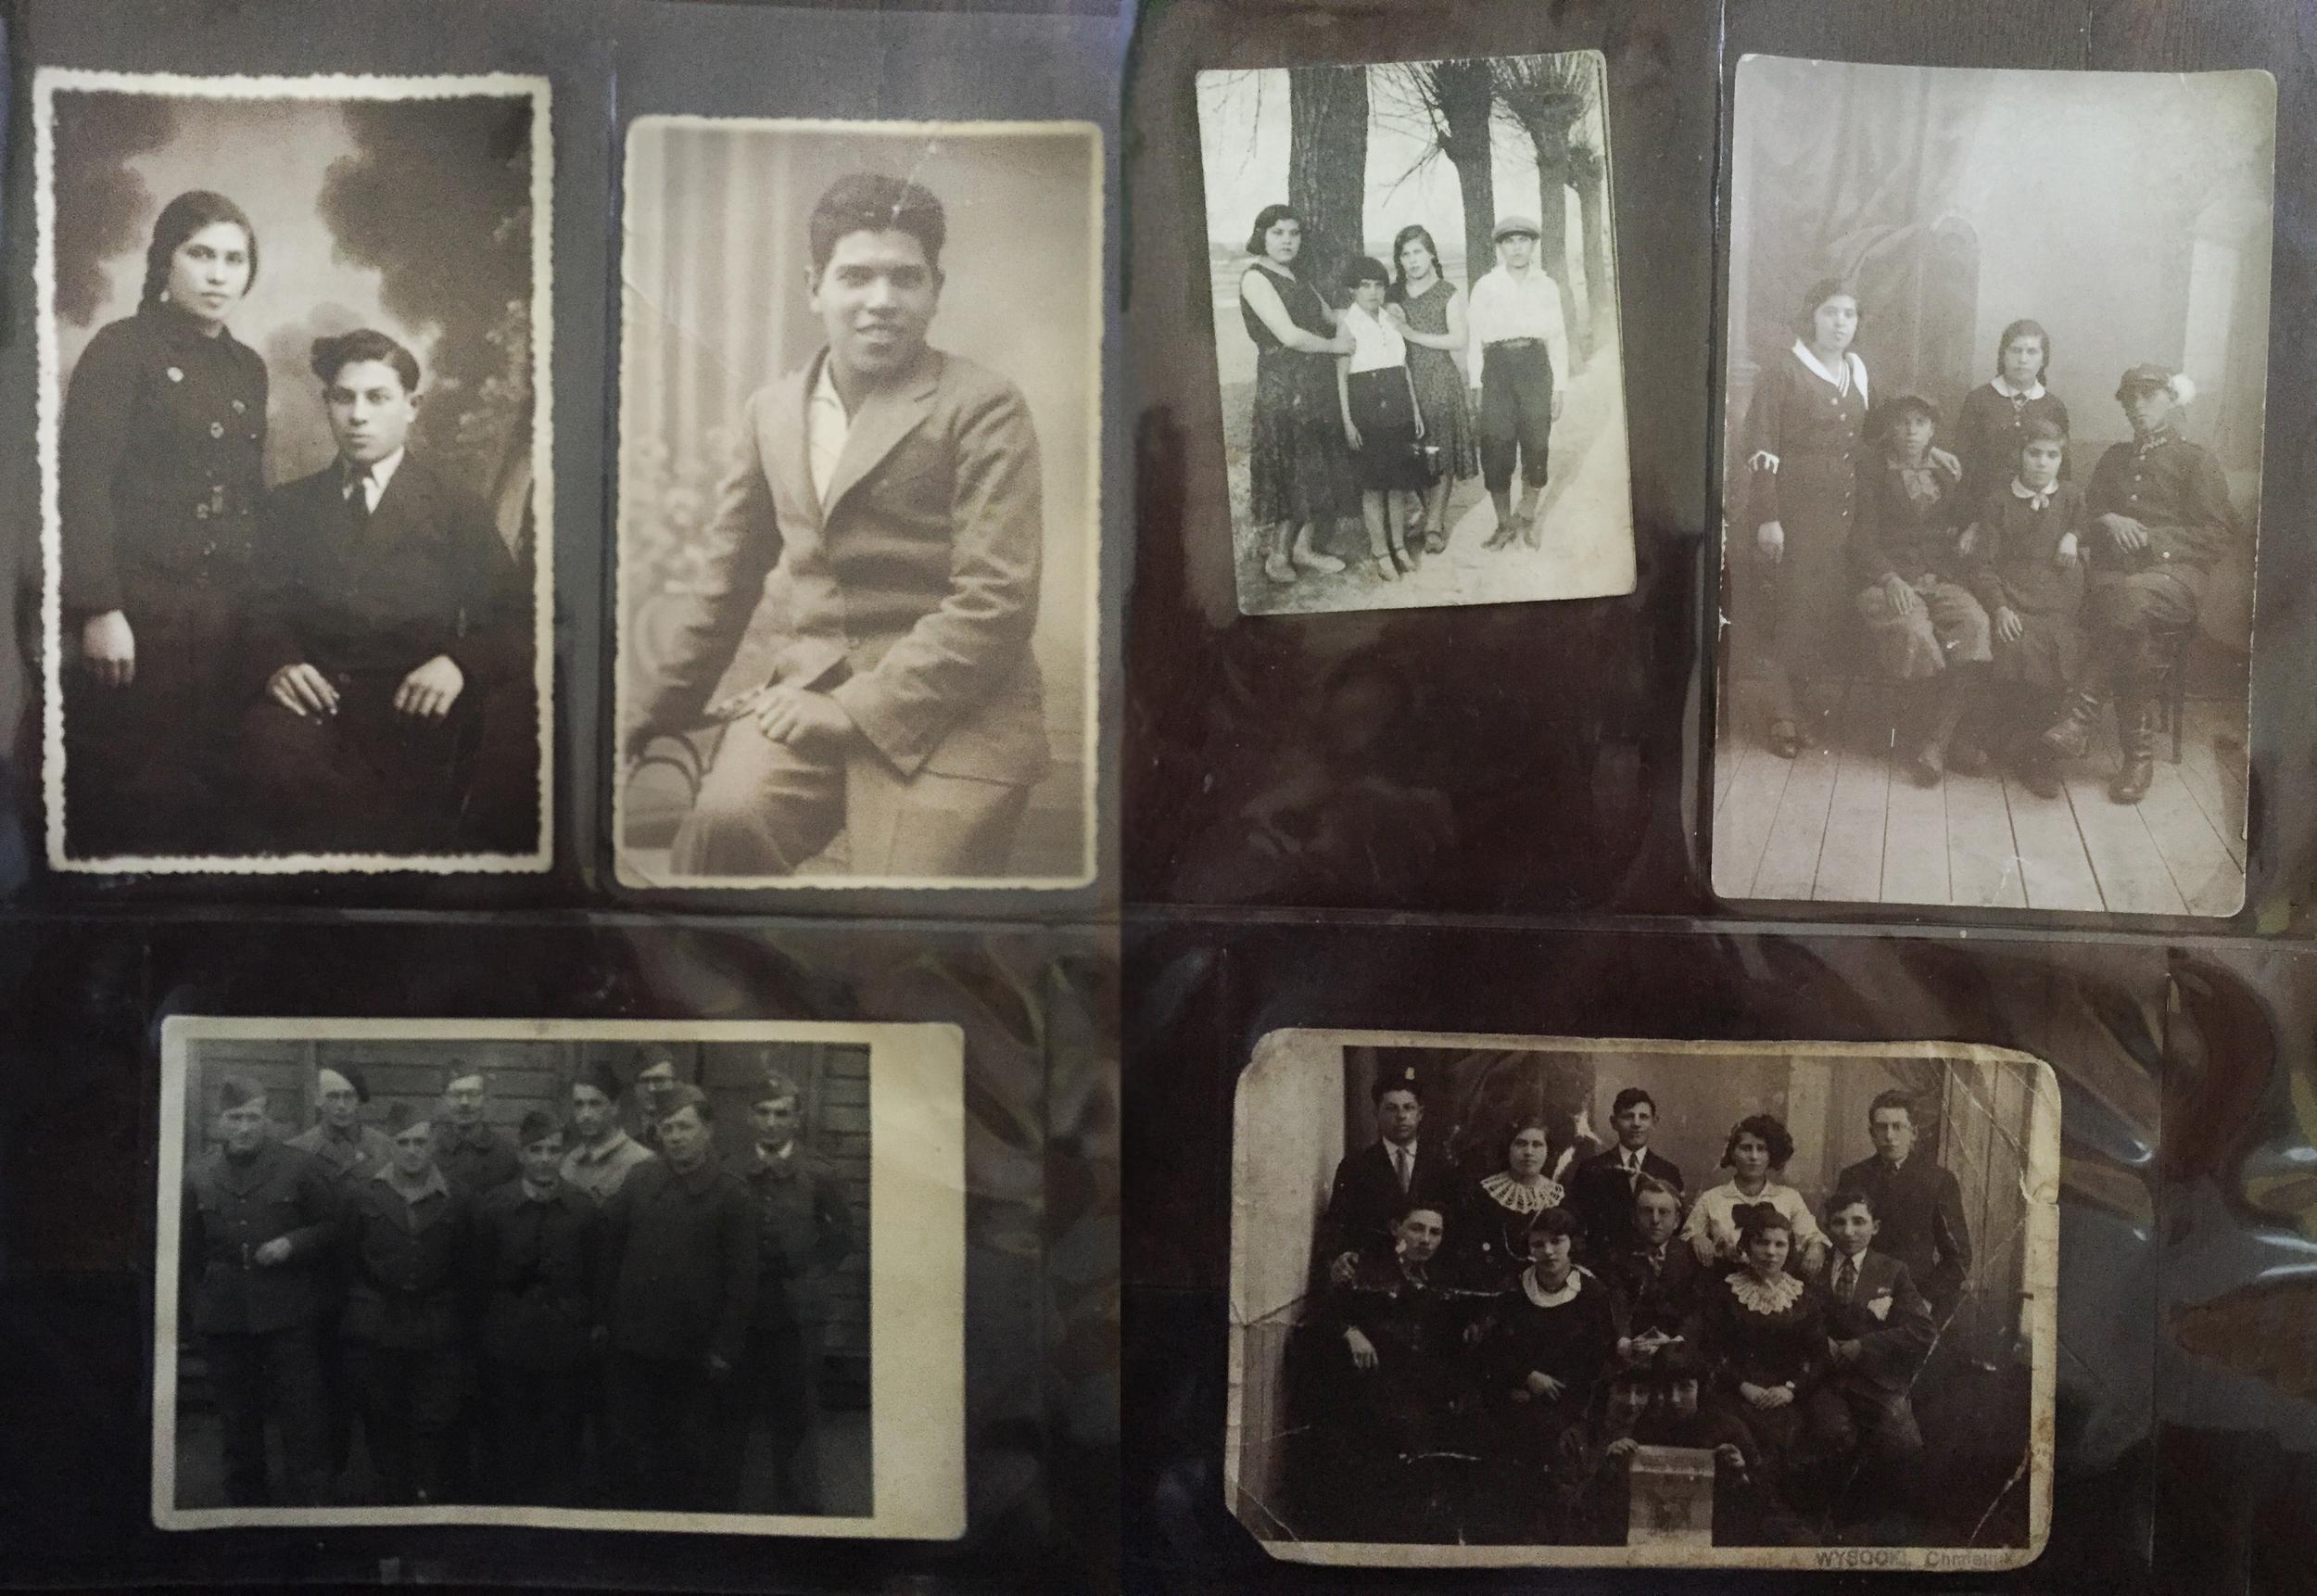 Janine Janowski's family album. Photographs from Poland, 1930's, Muriel Hasbun archive.